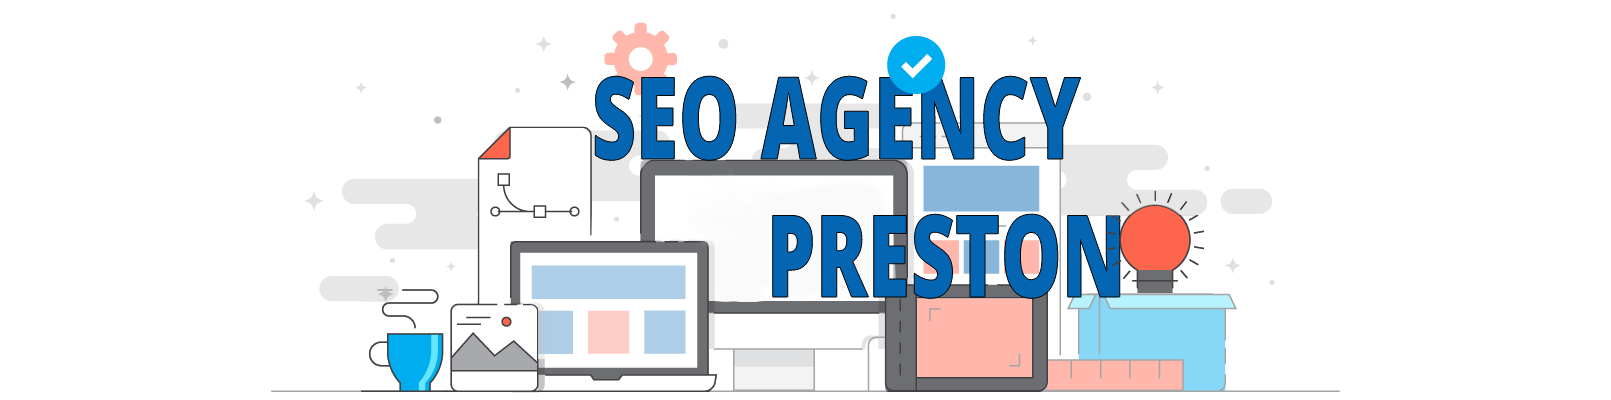 seek social seo agency preston header with transparent background